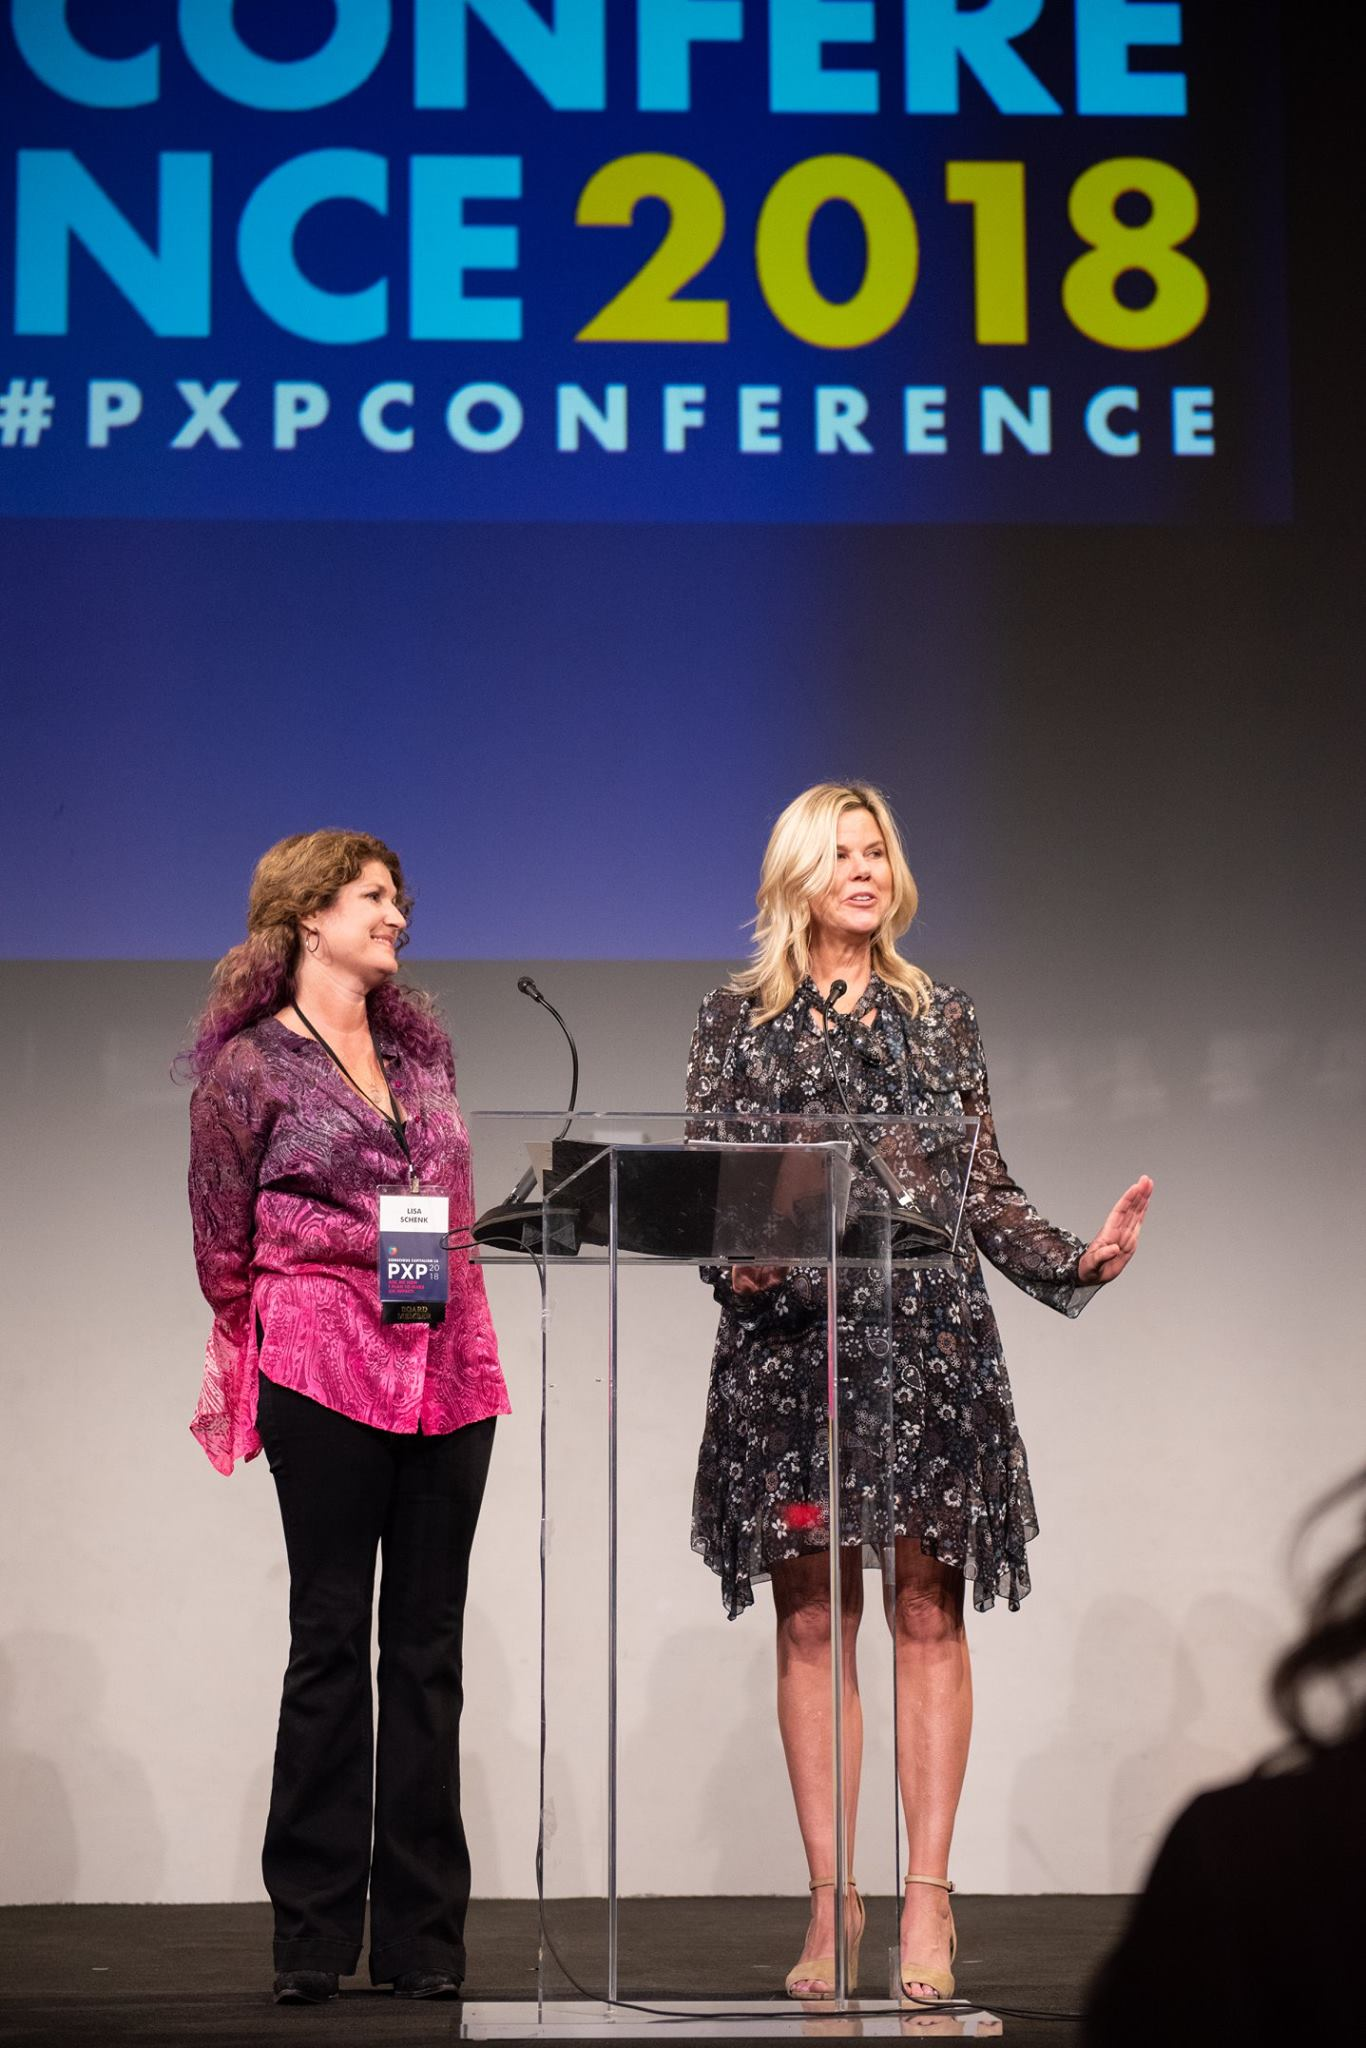 Conscious Capitalism LA - PurposexProfit conference